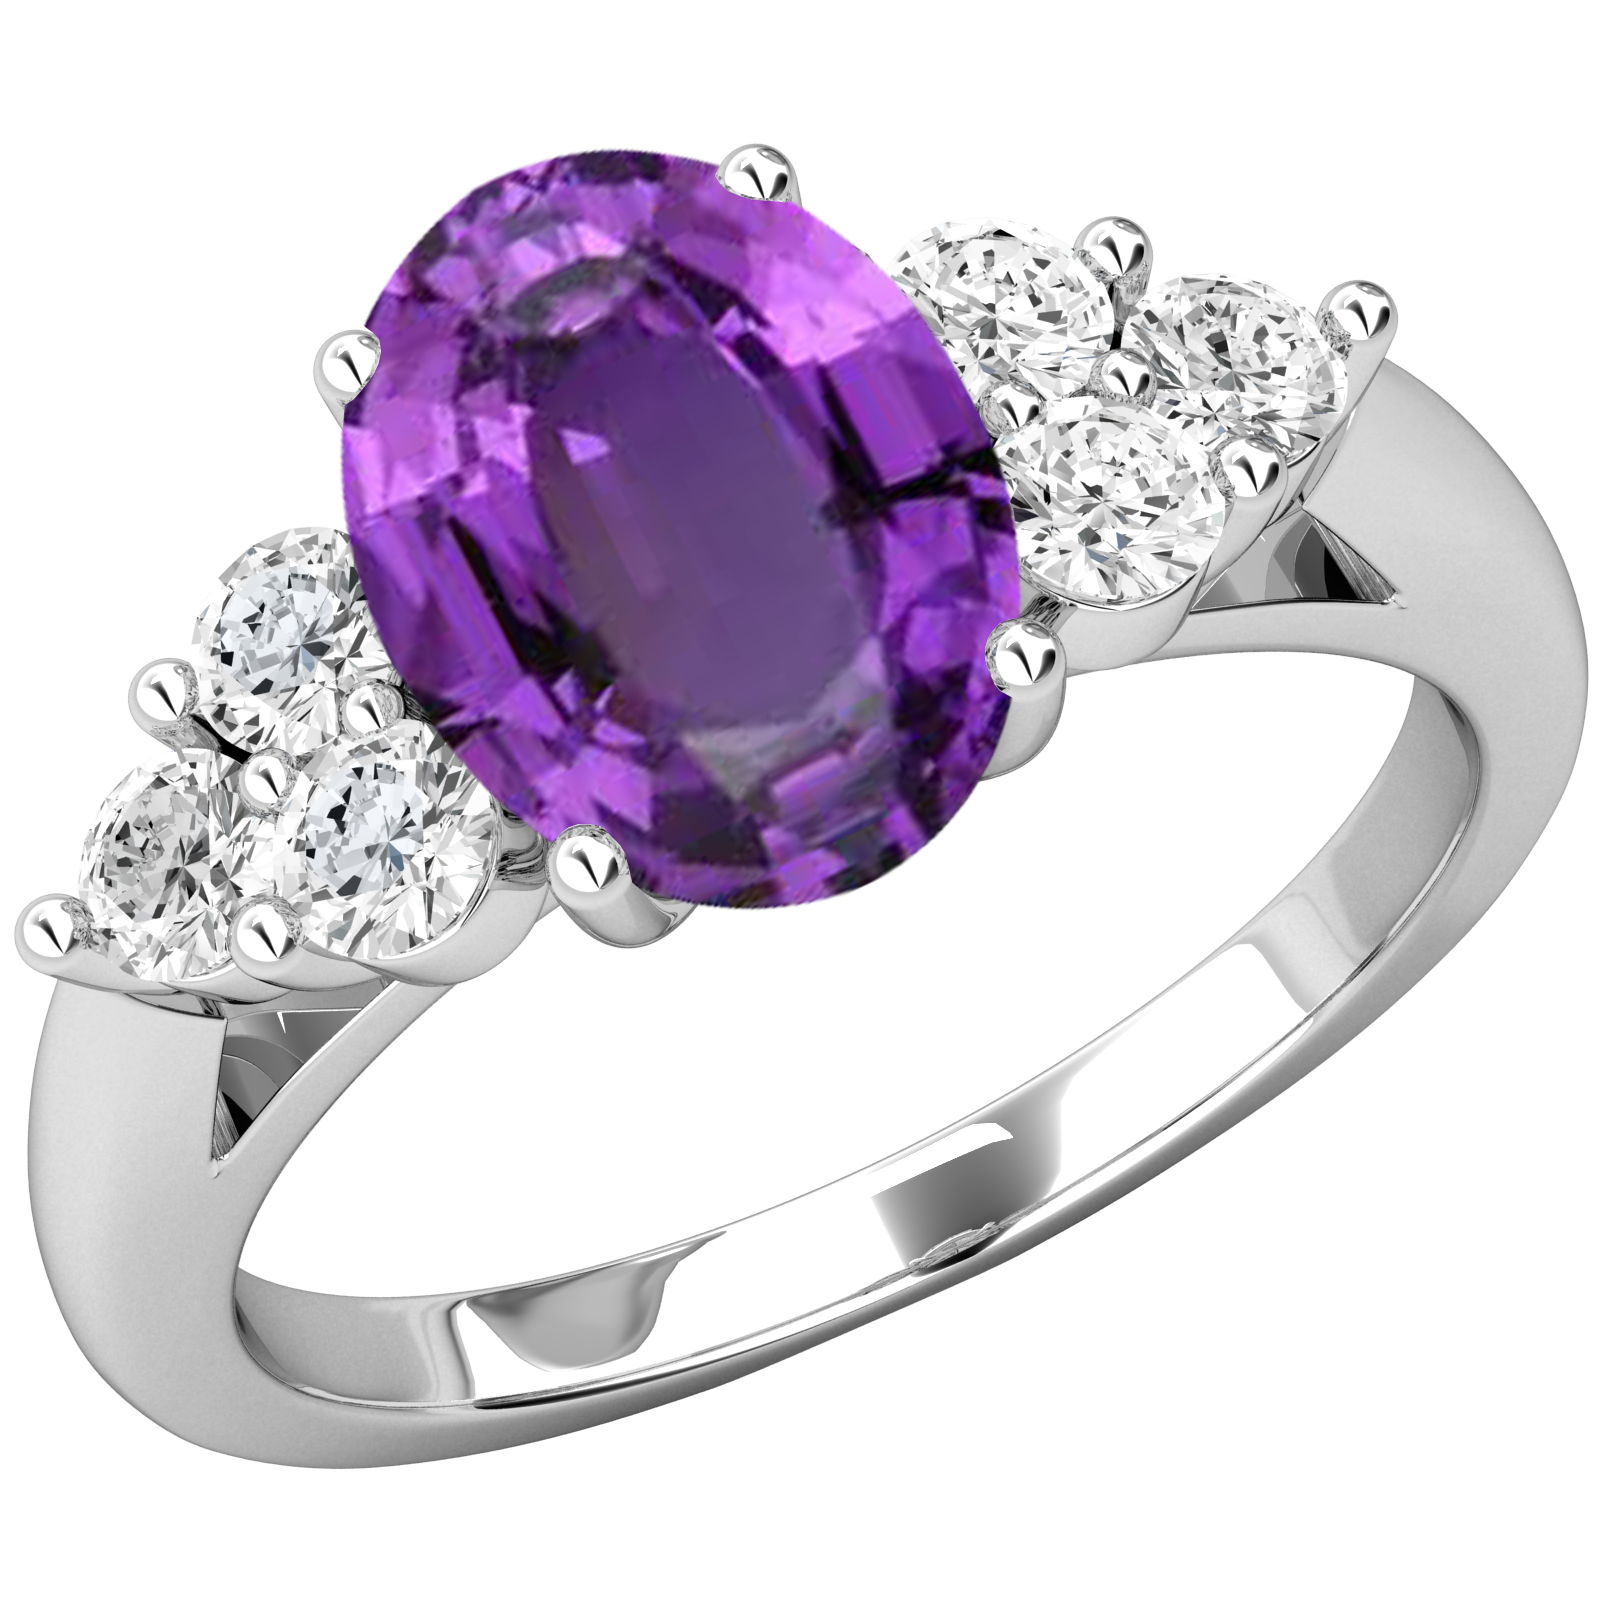 Inel cu Ametist si Diamant Dama Aur Alb 18kt cu Ametist Oval si 3 Diamante Rotund Briliant pe Fiecare Parte-img1